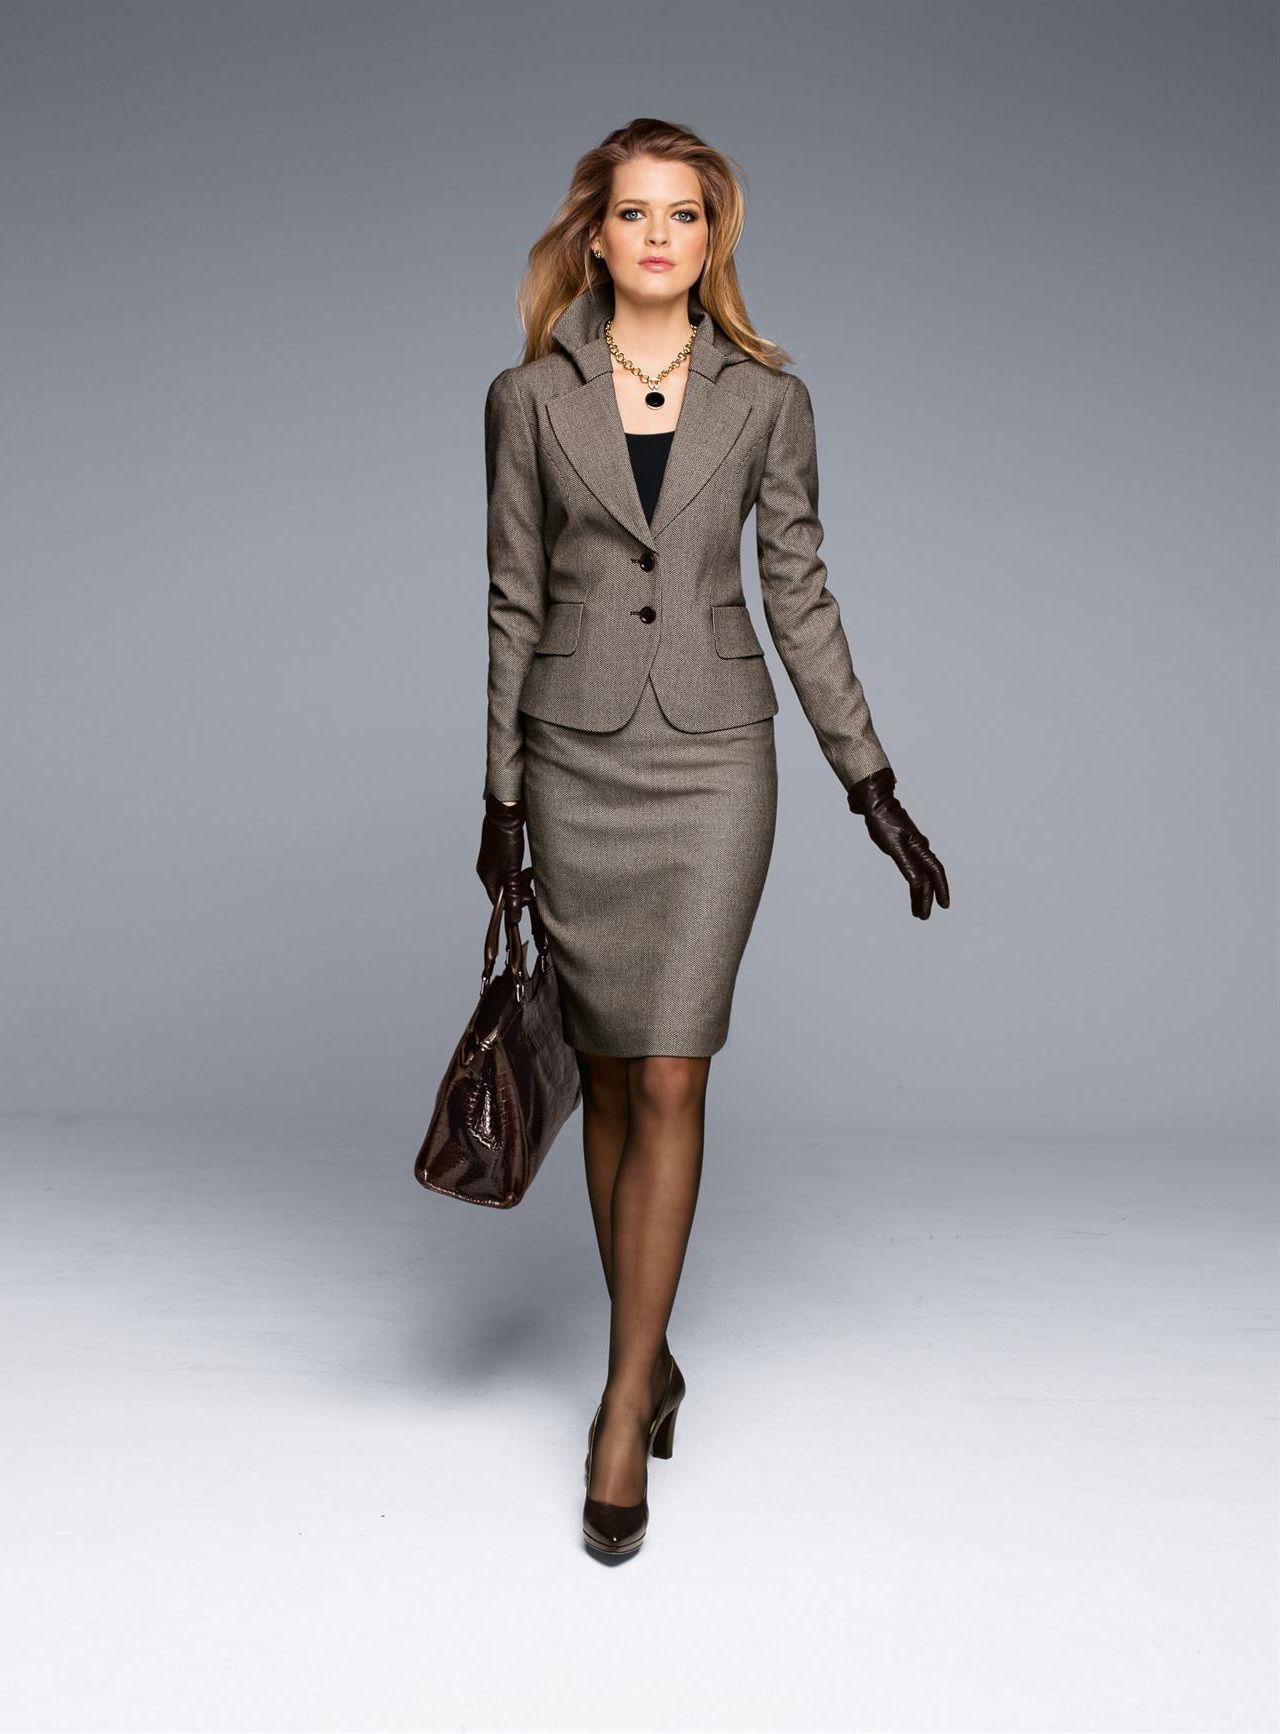 Skirt suits, uniforms, amazing dresses...: Photo | Buscando Tu ...